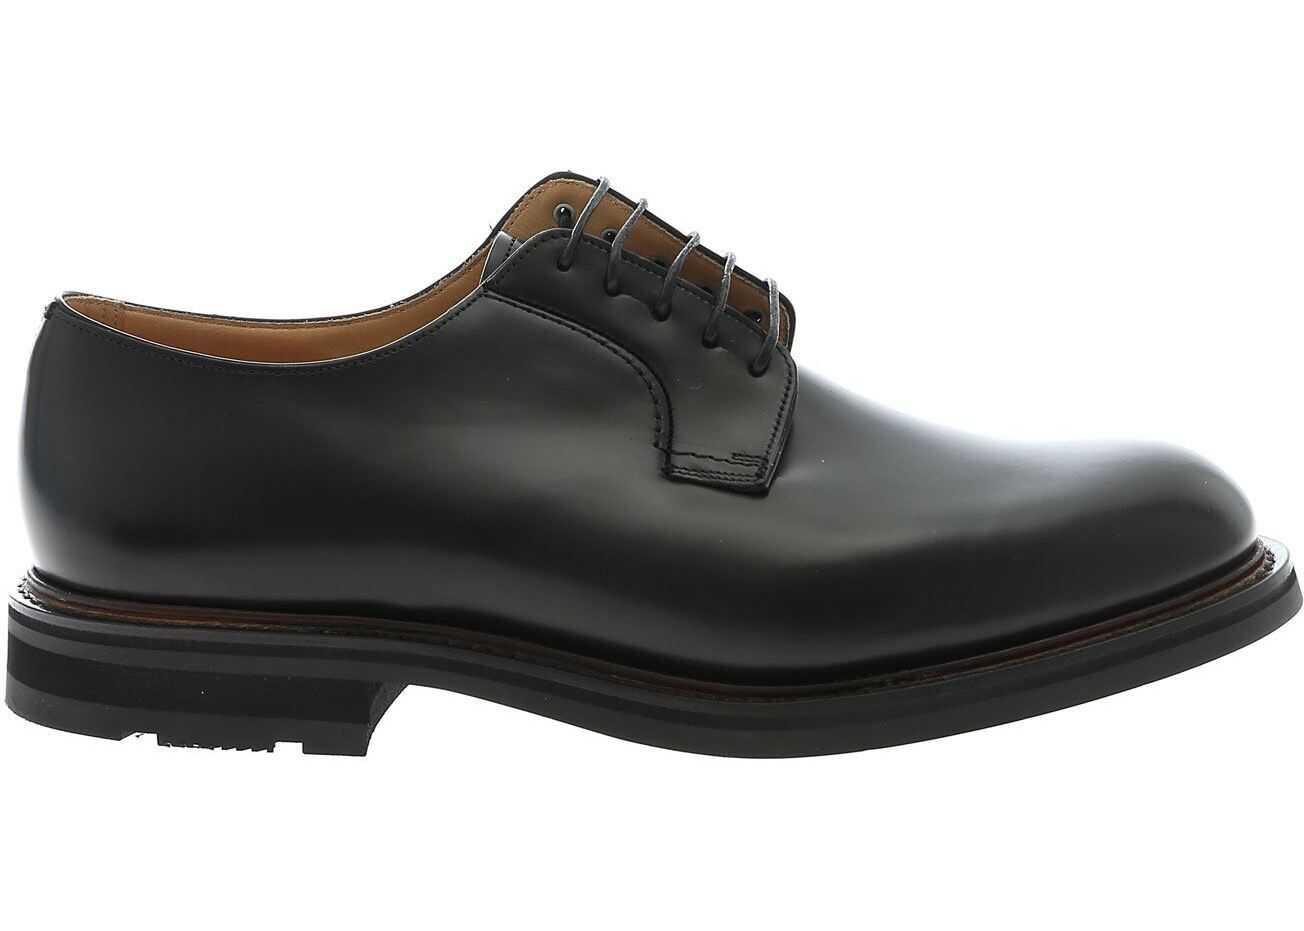 Woodbridge Derby Shoes In Black thumbnail